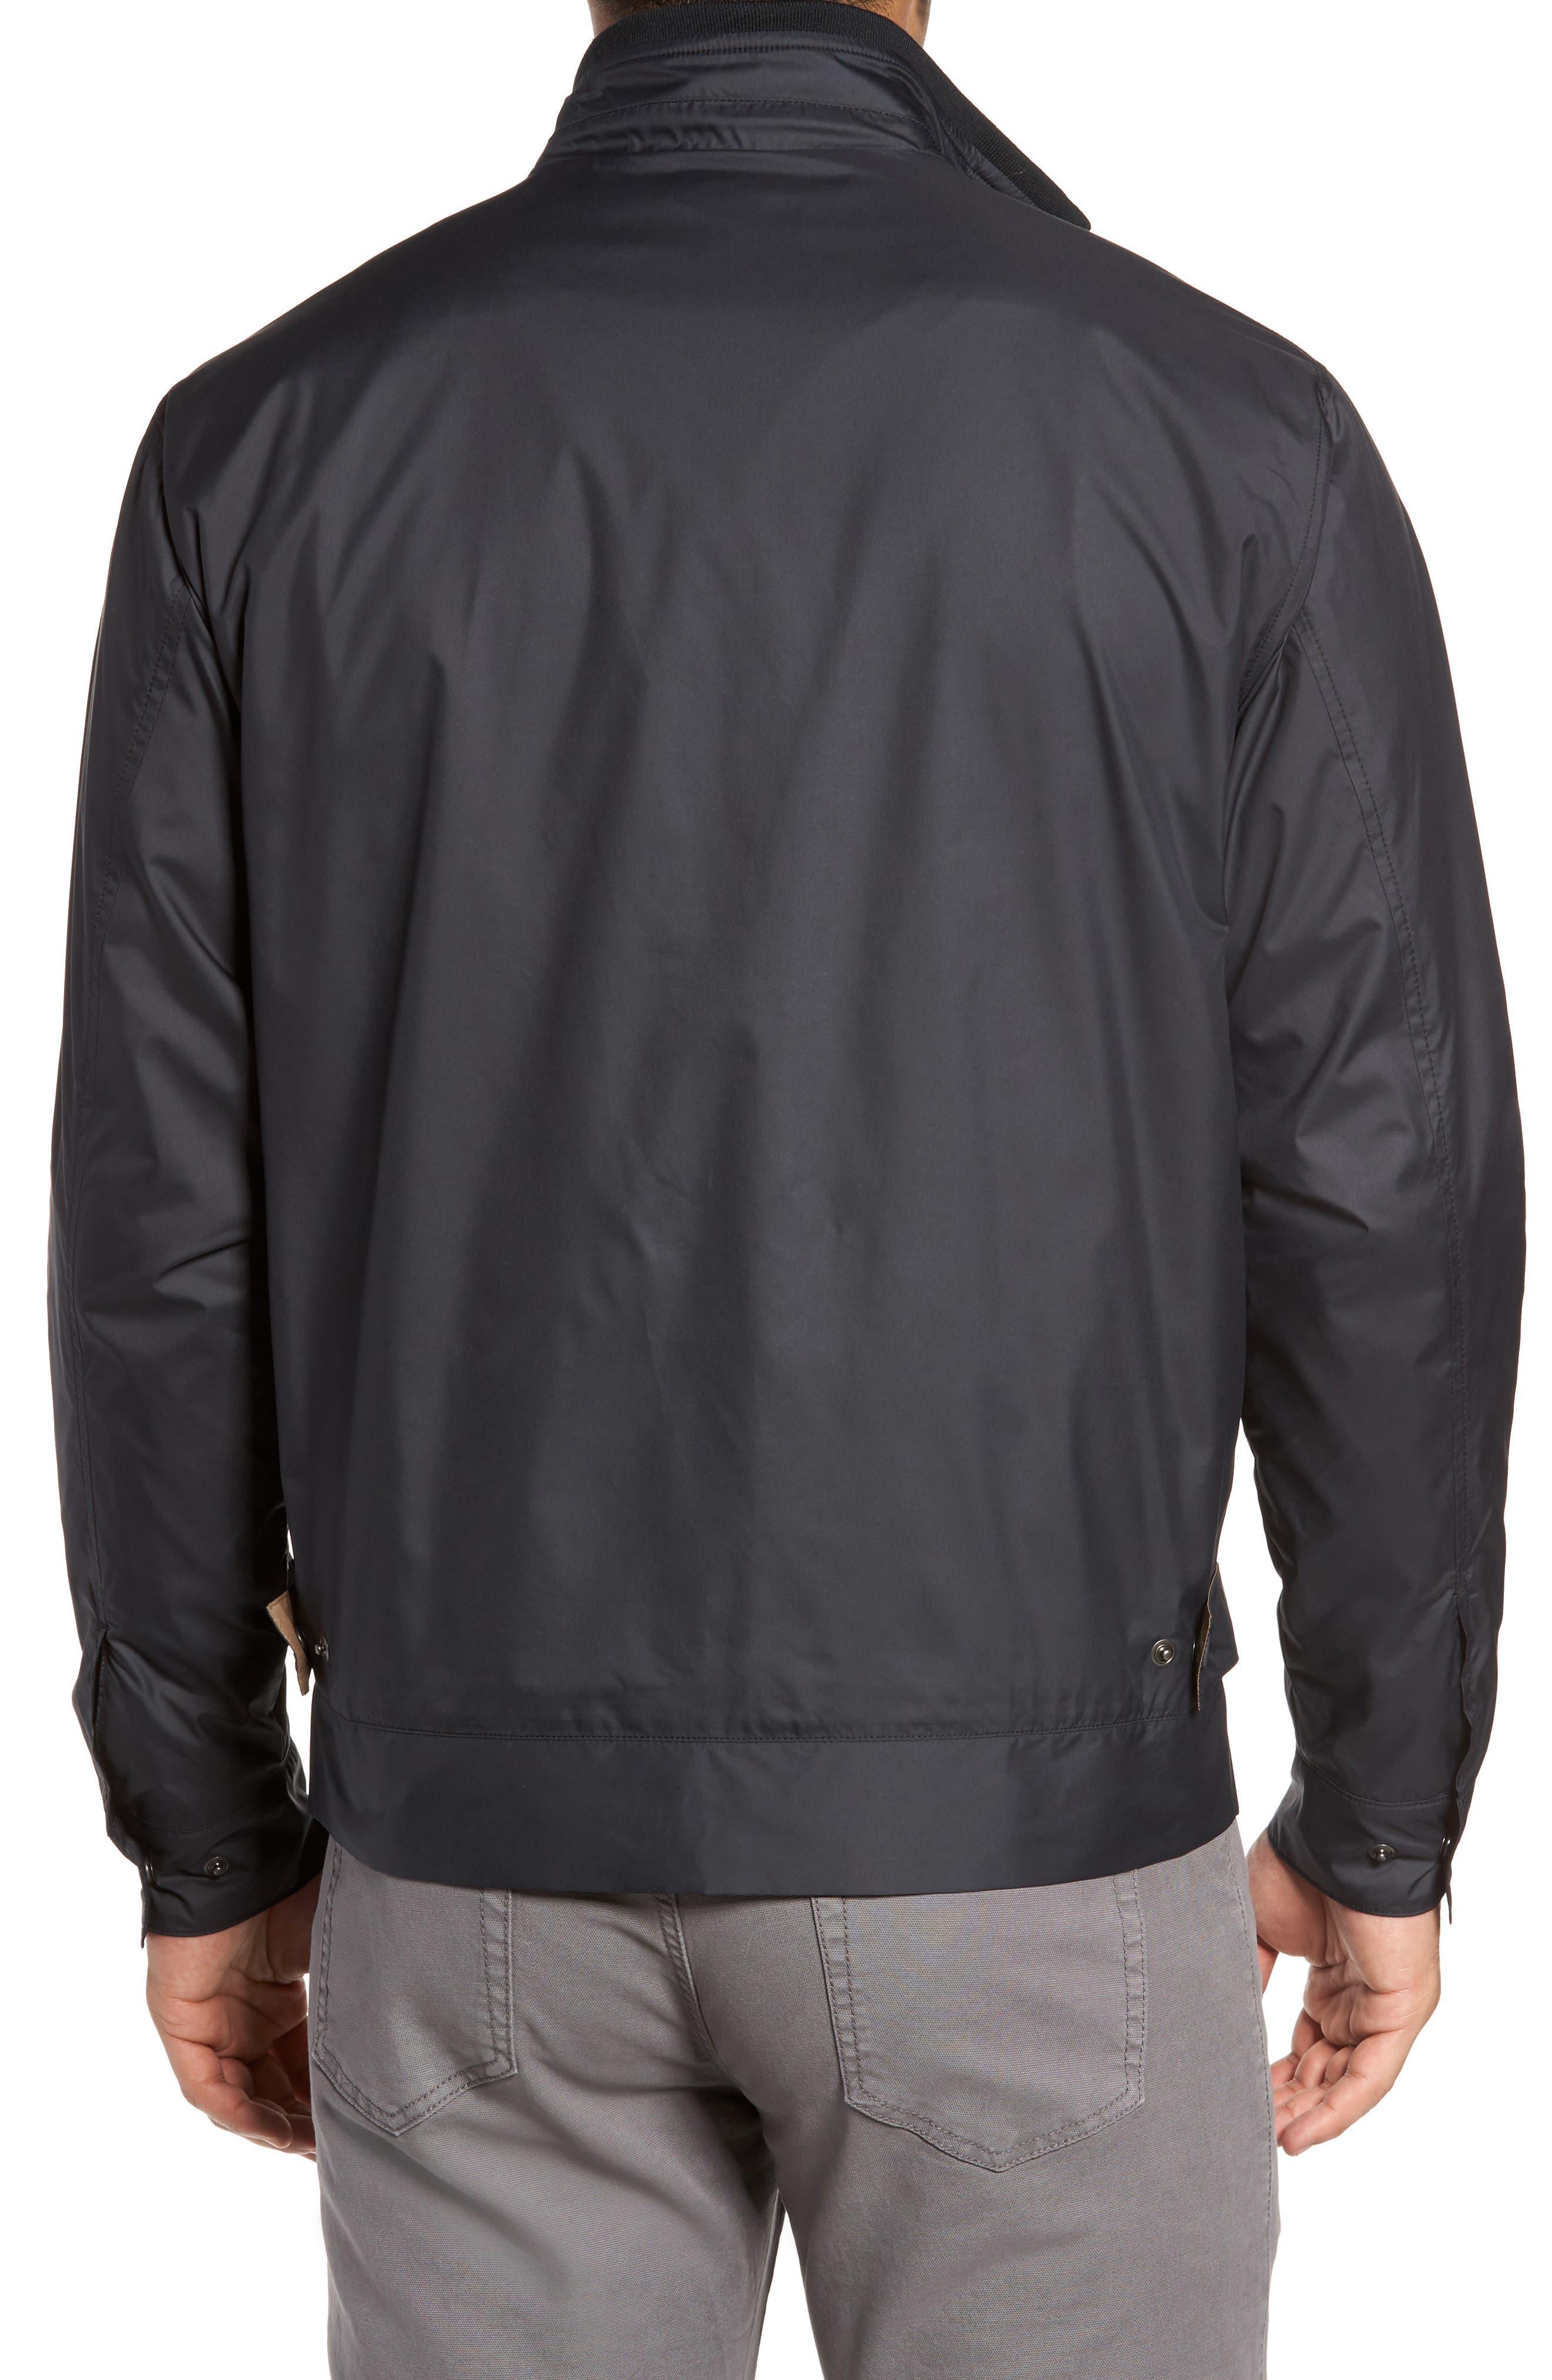 PETER MILLAR, Zip Jacket, Alternate thumbnail 2, color, BLACK